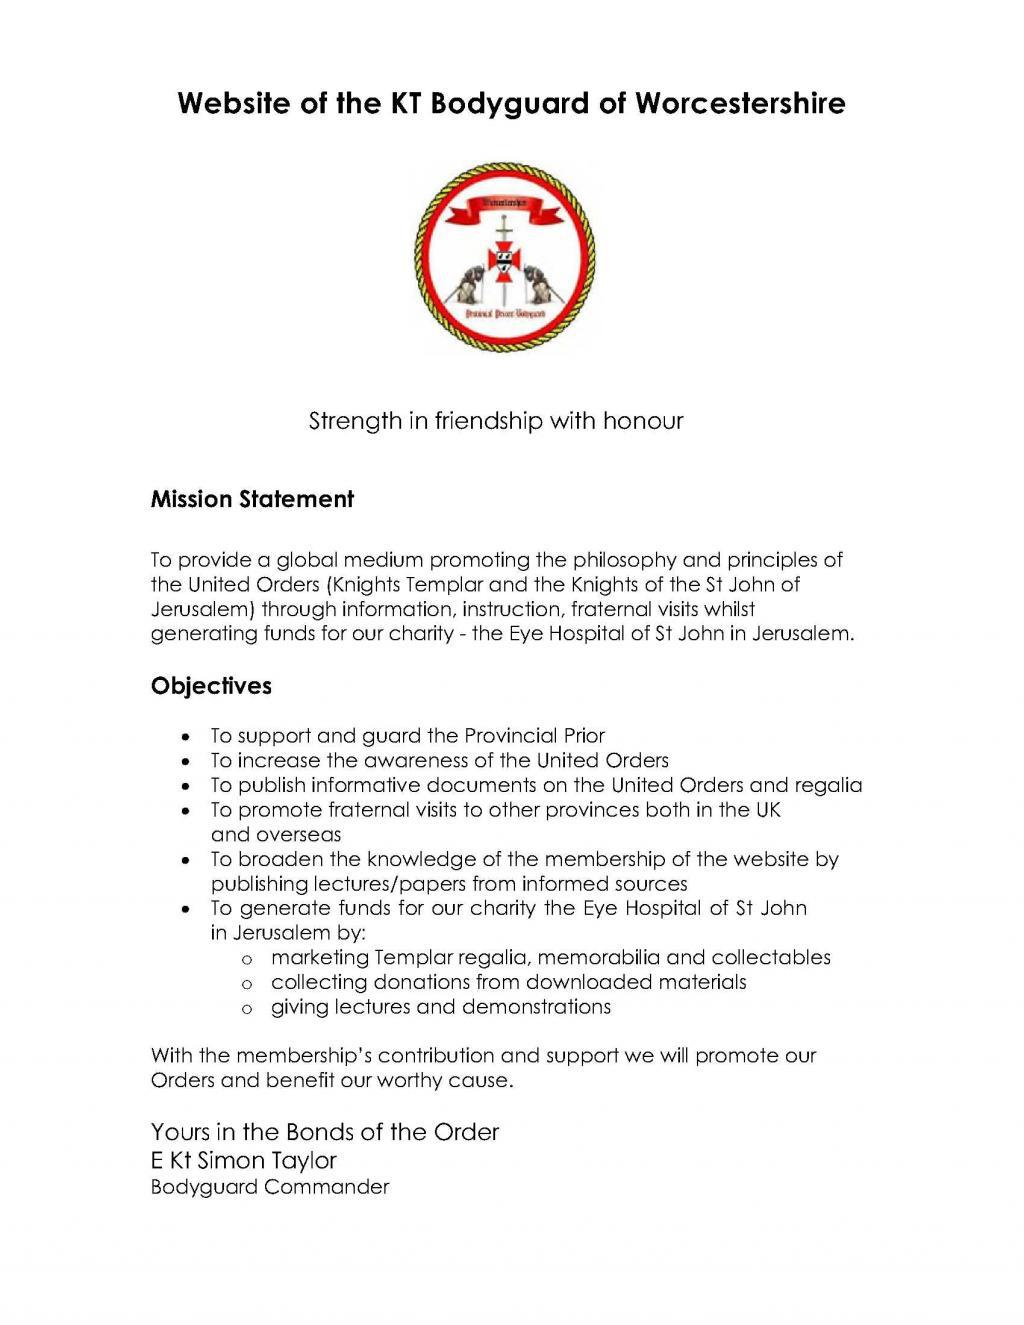 Bodyguard Mission Statement Nov 2017.jpg